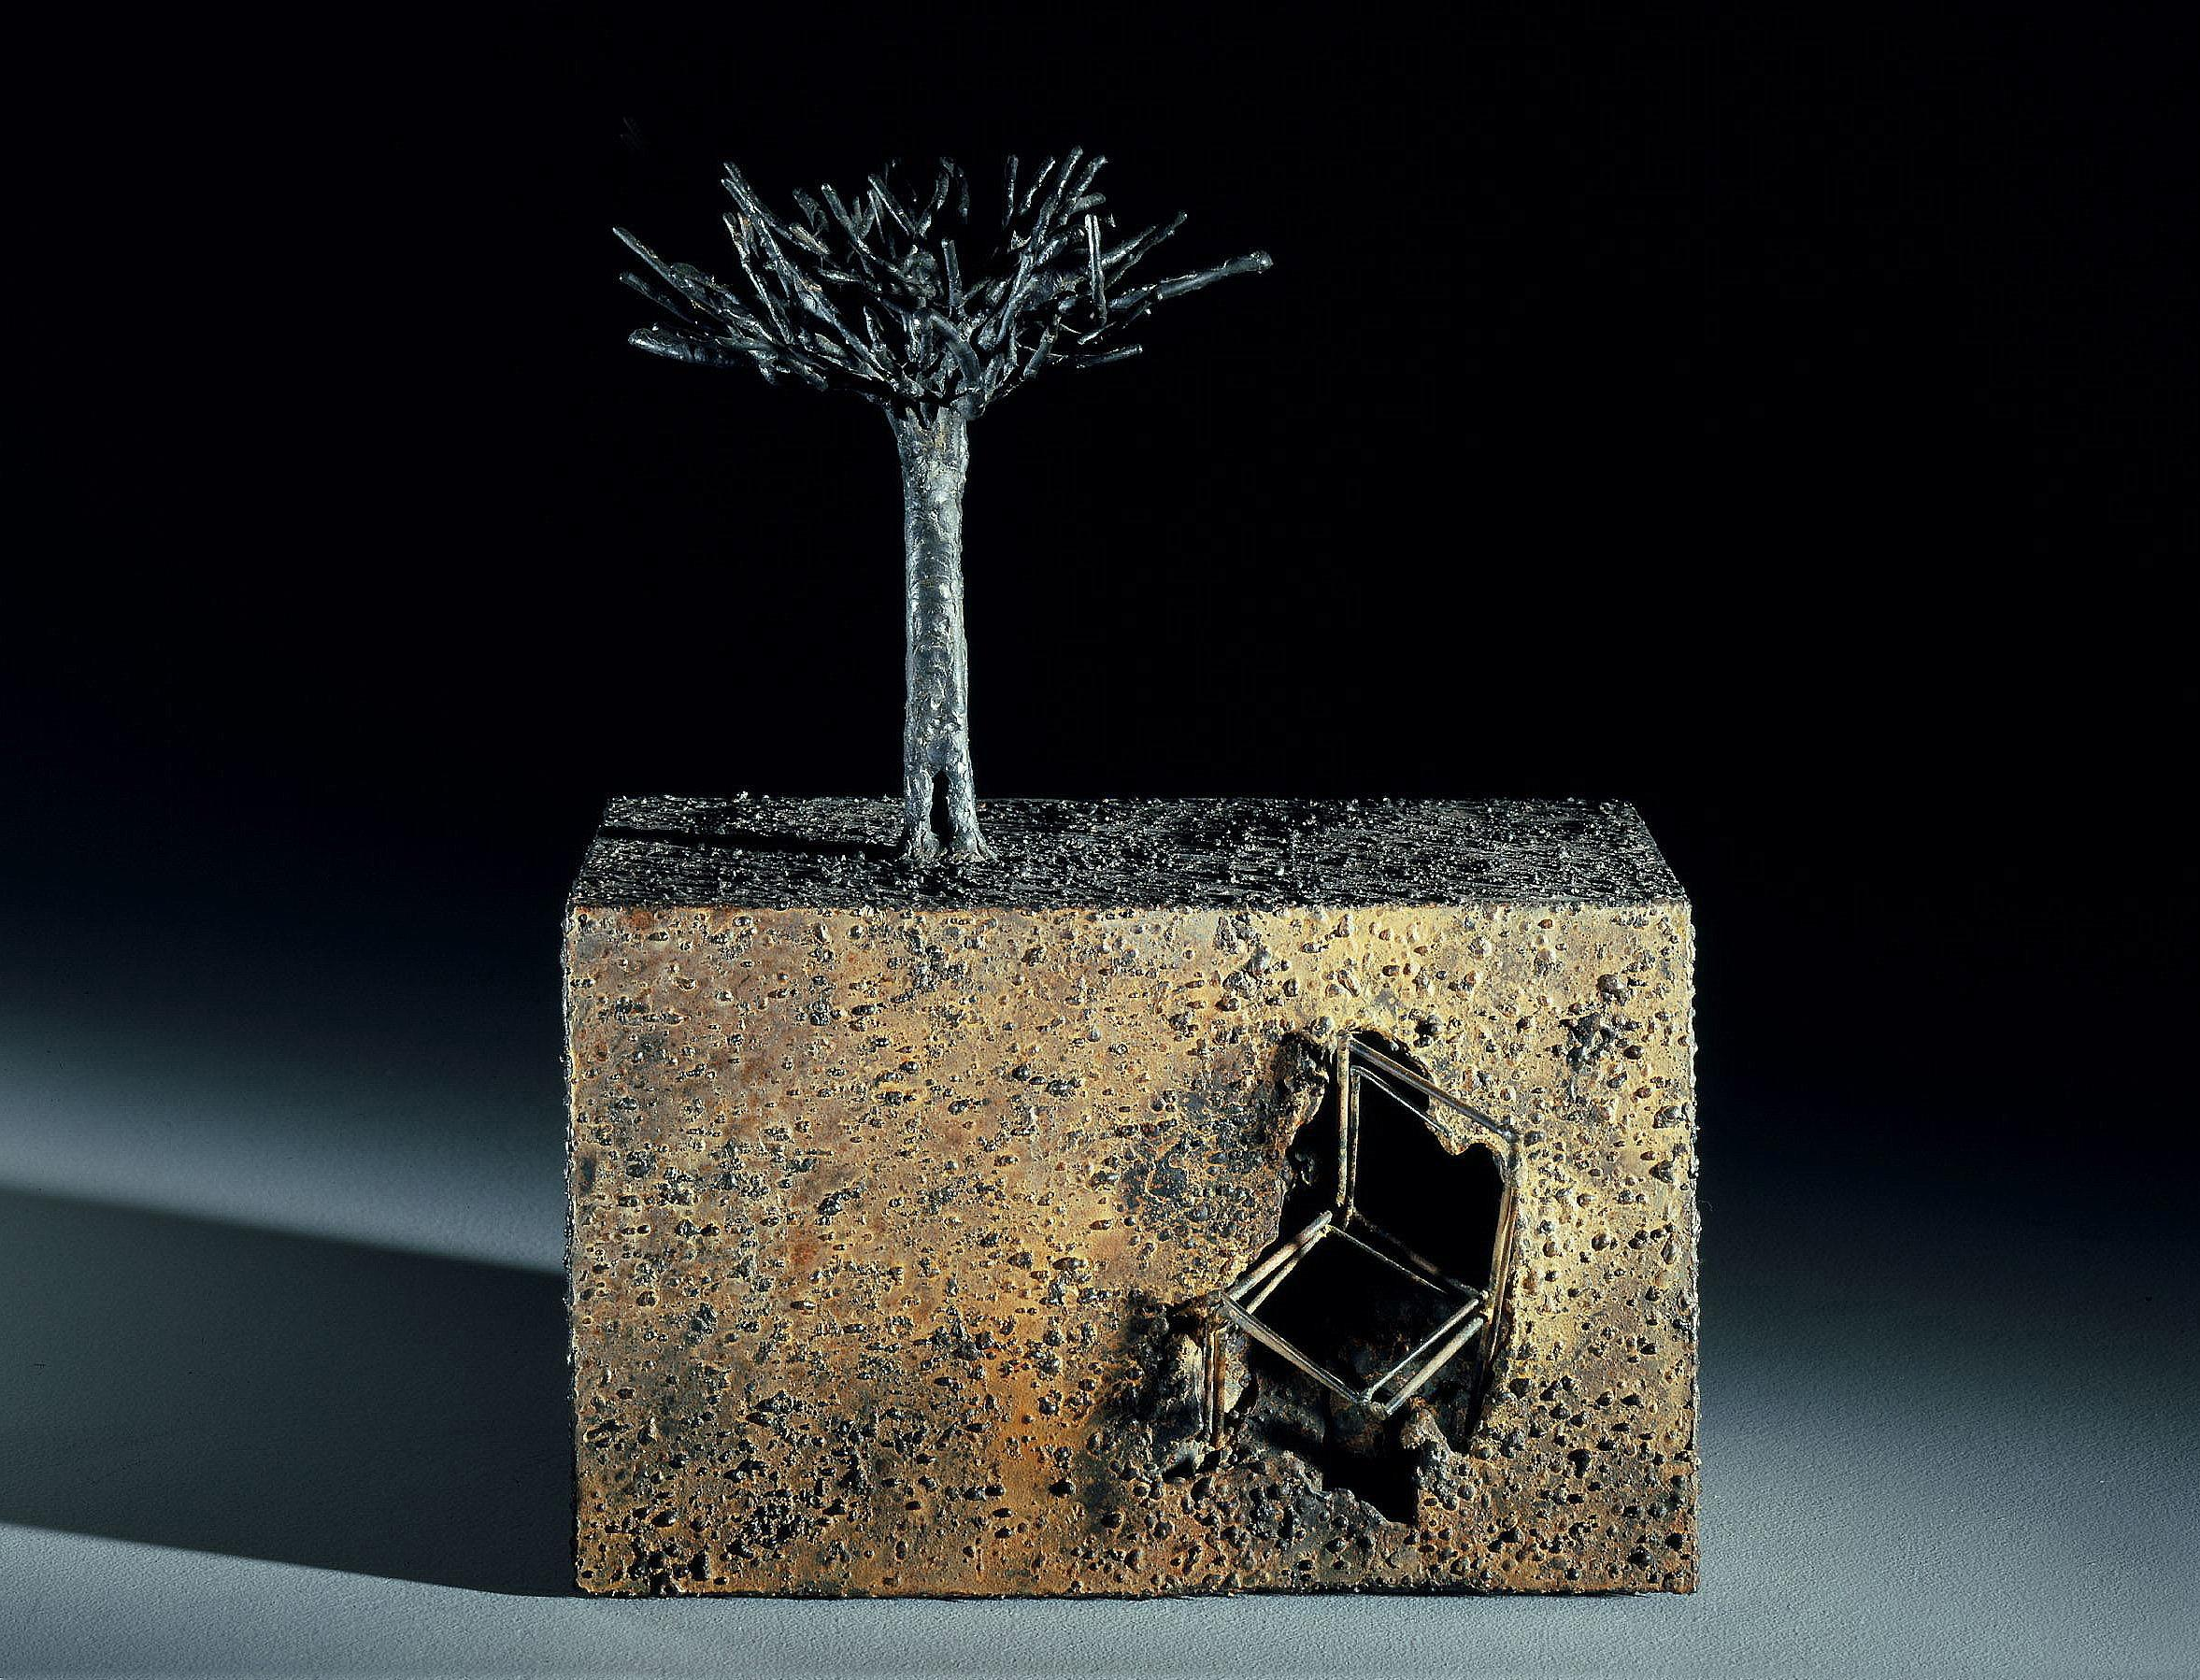 Archeology - Jean-Paul Réti, 21st Century, Contemporary metal sculpture